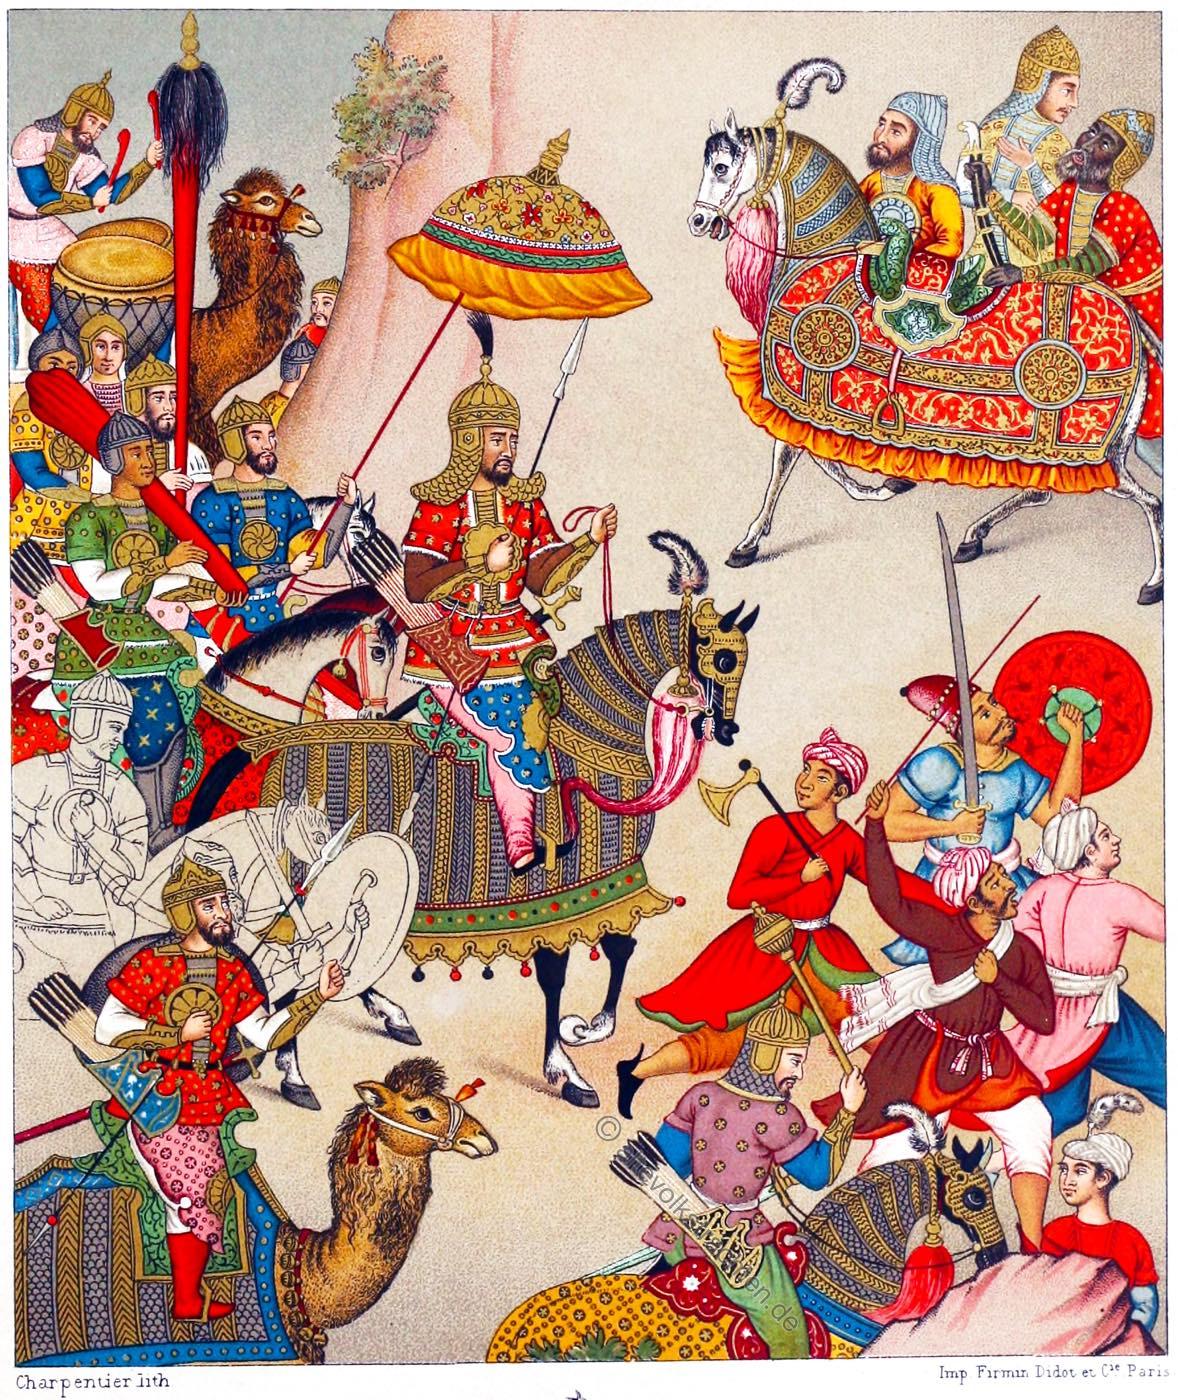 Großmogul, Babur, Indien, Kriegstrachten, Rüstungen, Miniatur, Malerei,